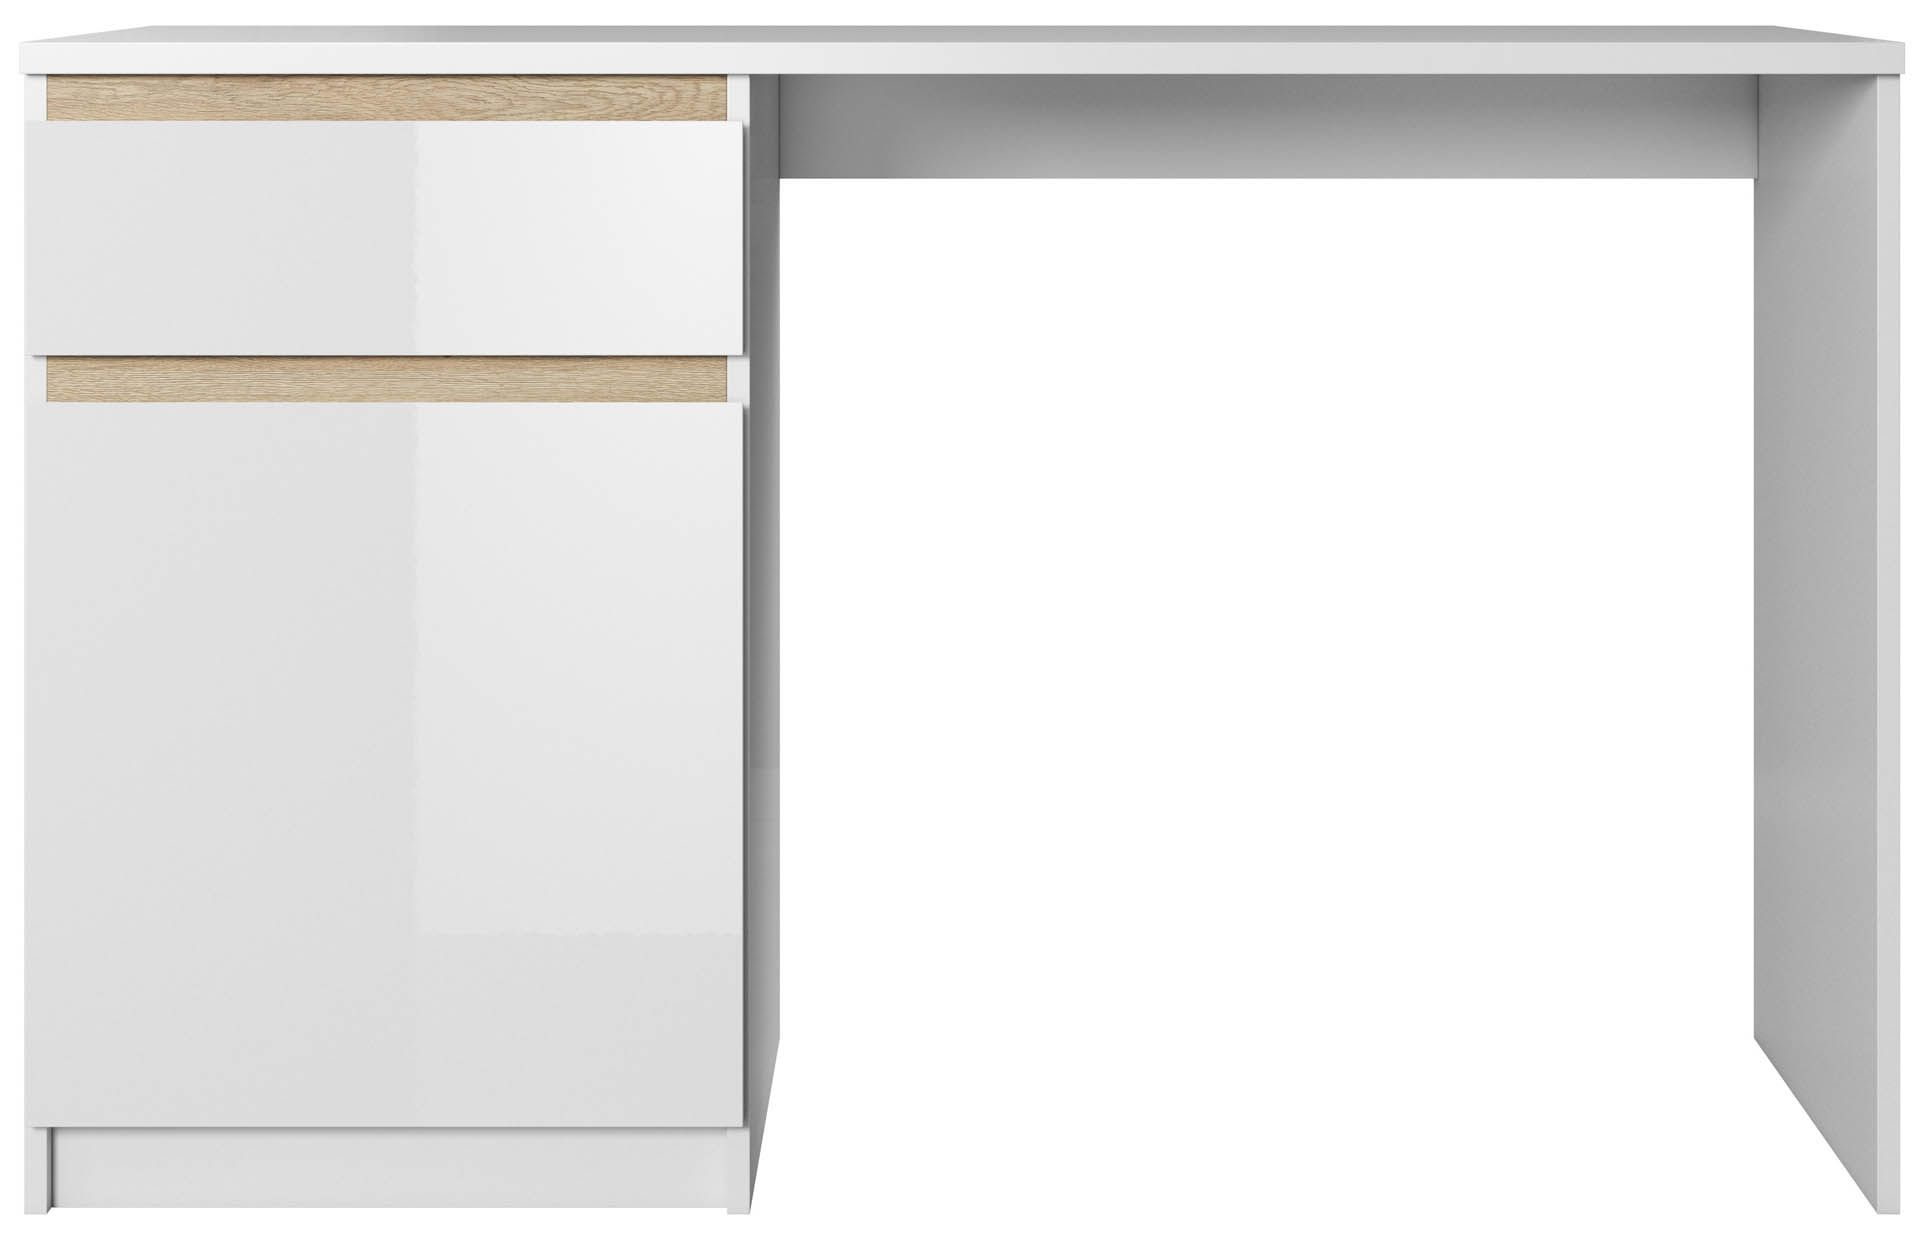 abra 18 06 28 master biurko 9 wprost